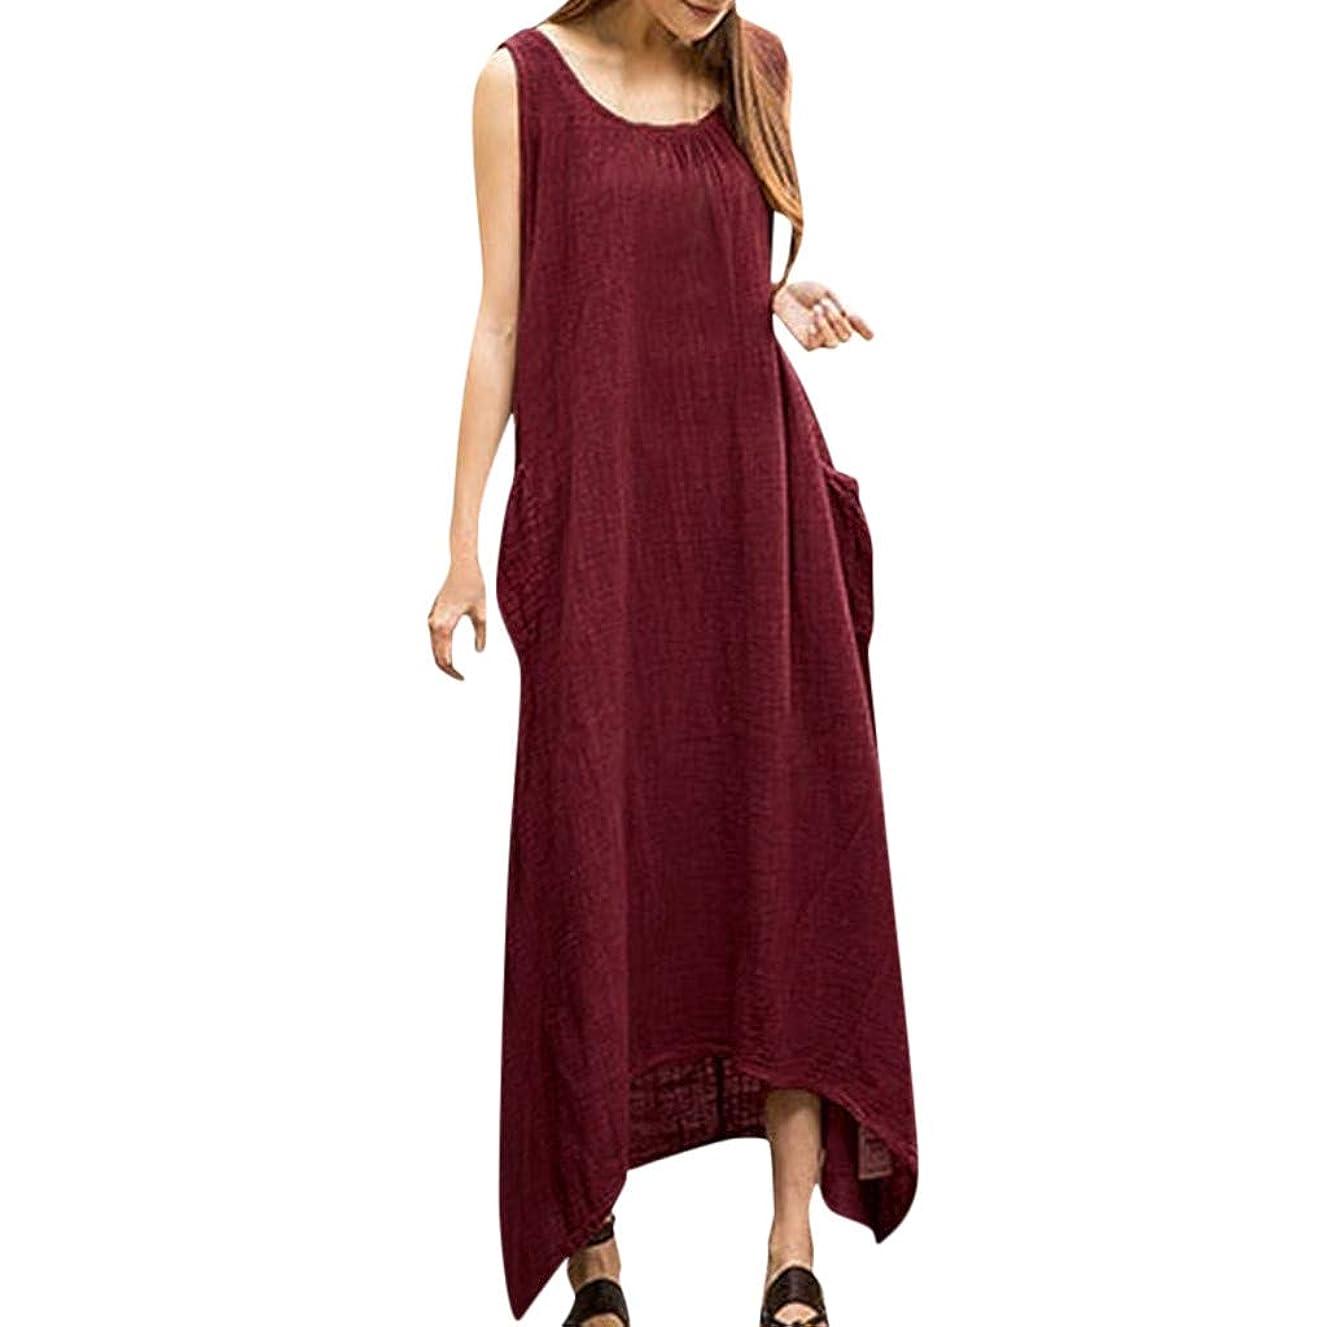 Usstore Women Maxi Dress Cotton Linen Irregular Plus Size Vintage Casual Boho Simply Sleeveless Pockets Tank Baggy Sundress